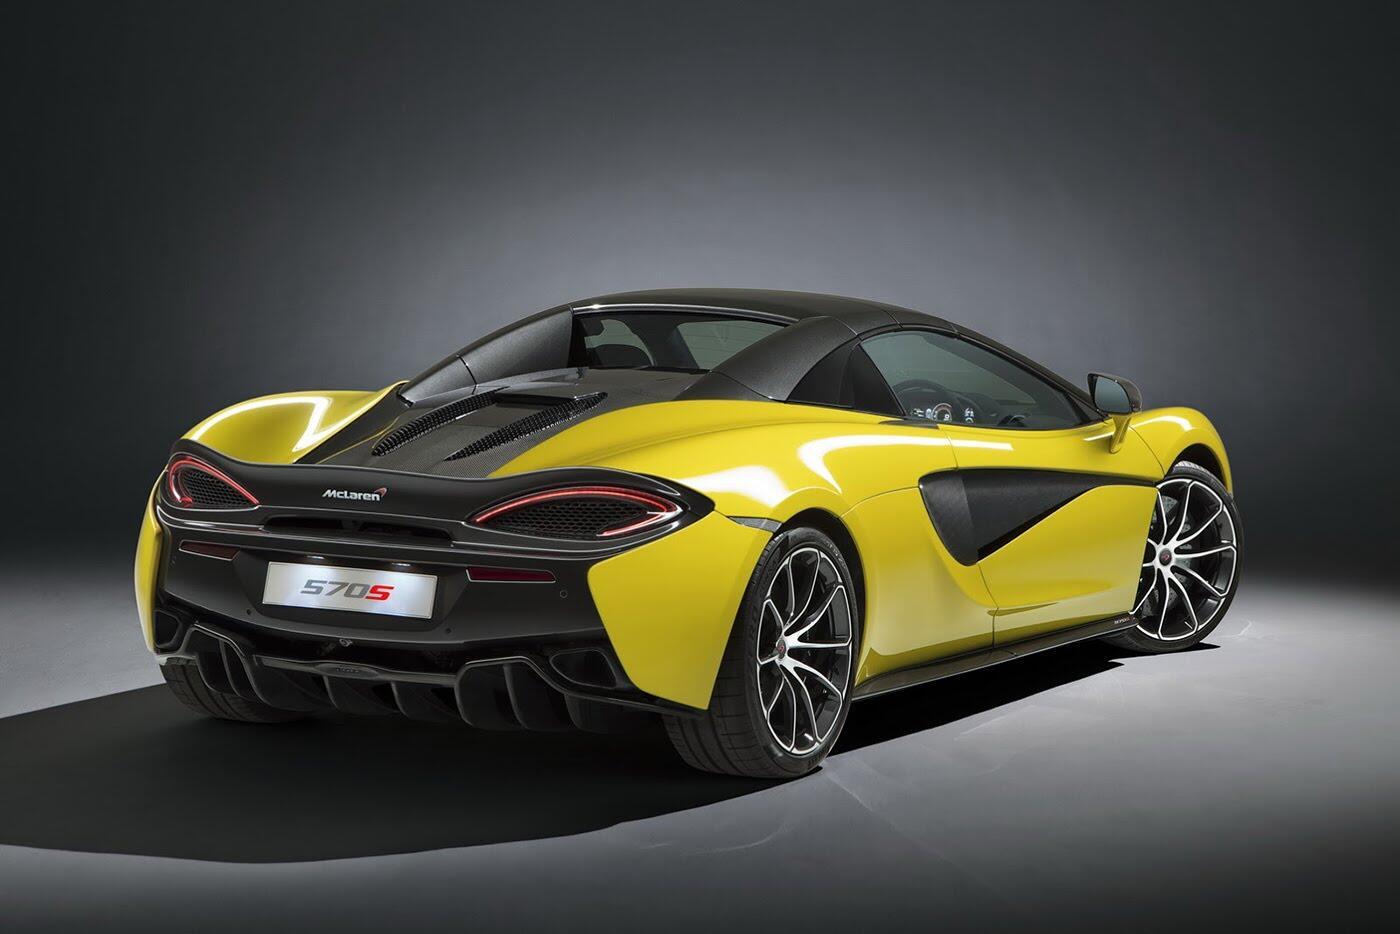 Siêu xe McLaren 570S Spider sắp ra mắt - Hình 10